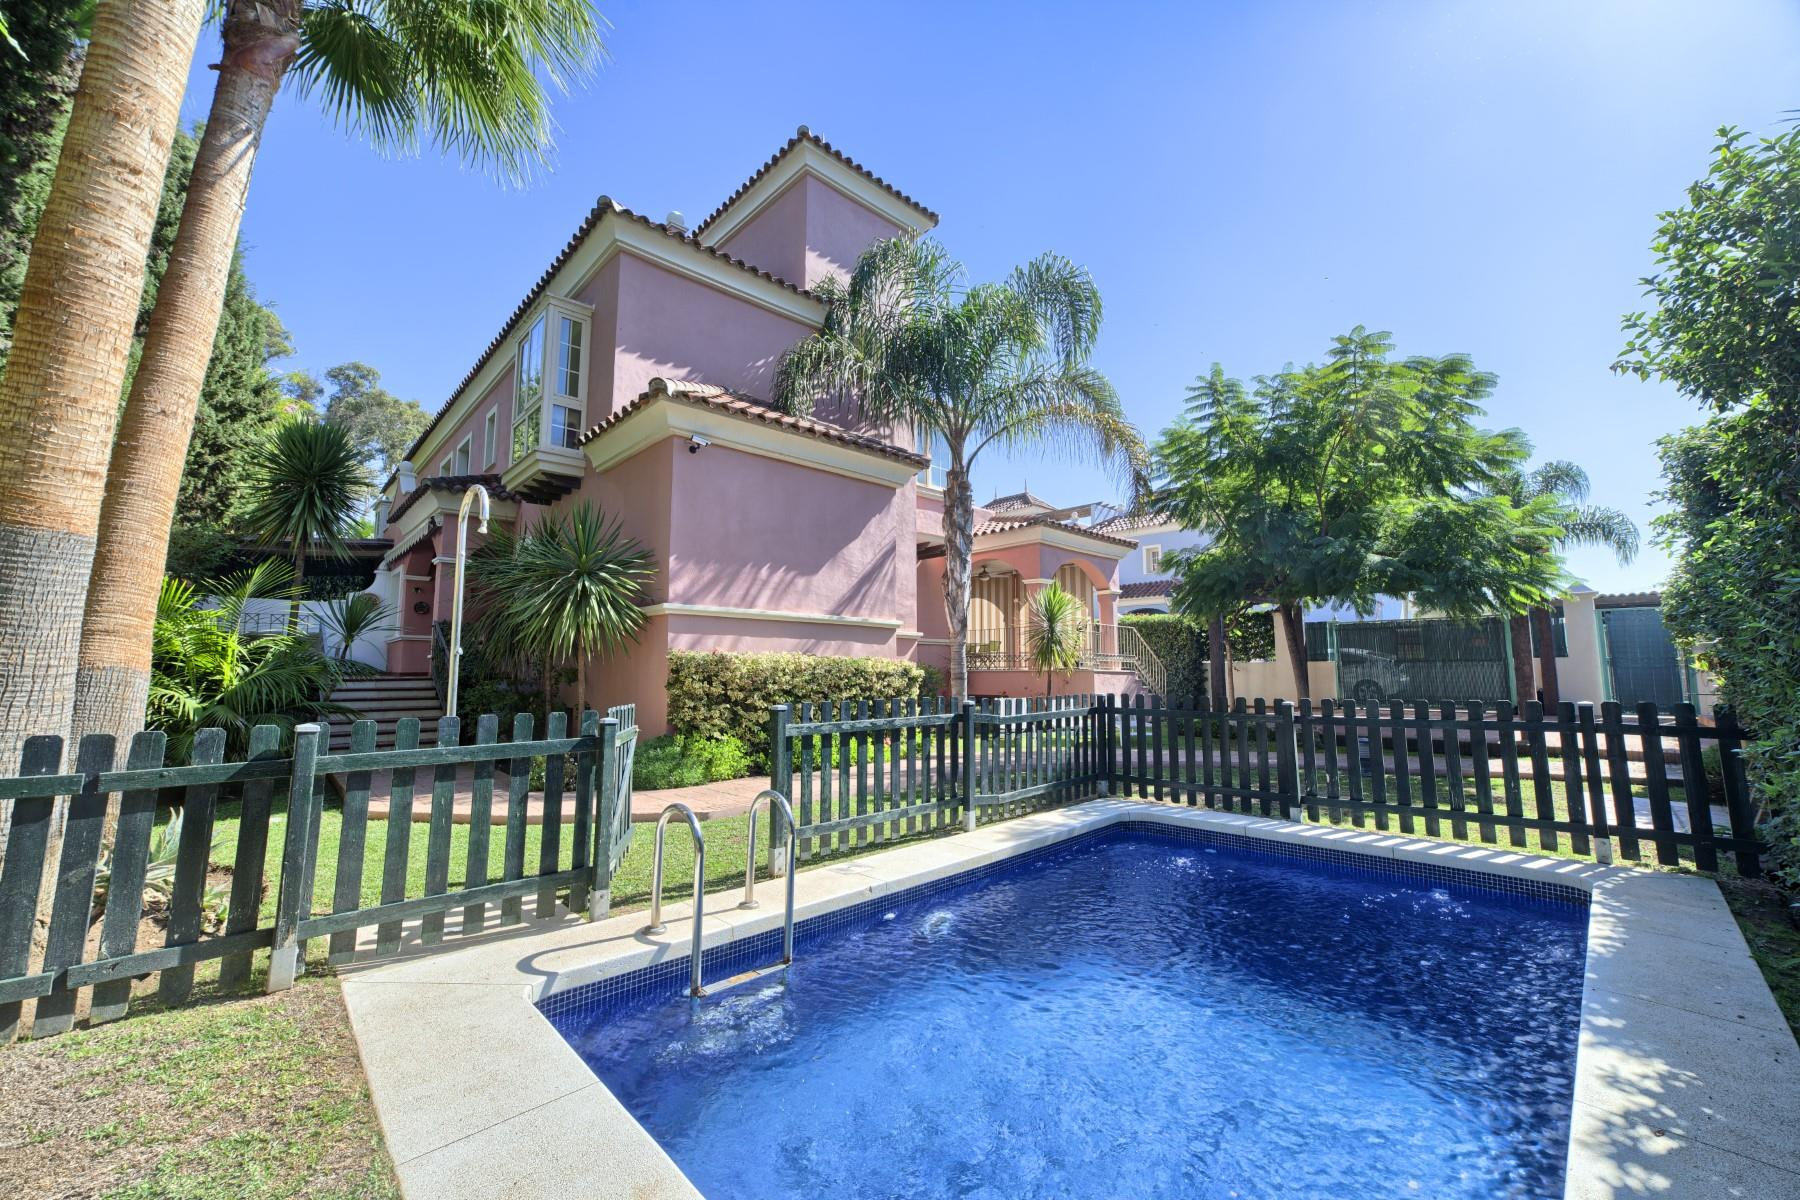 Villa walking distance from Puerto Banus